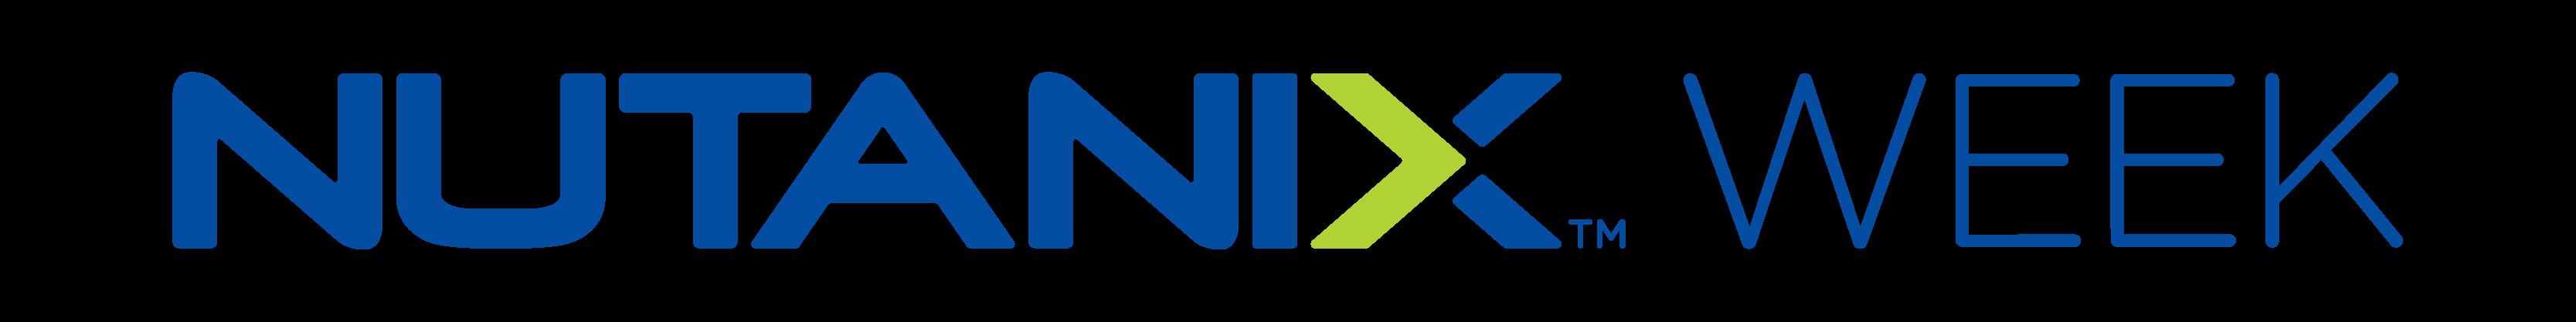 Nutanix Week DE